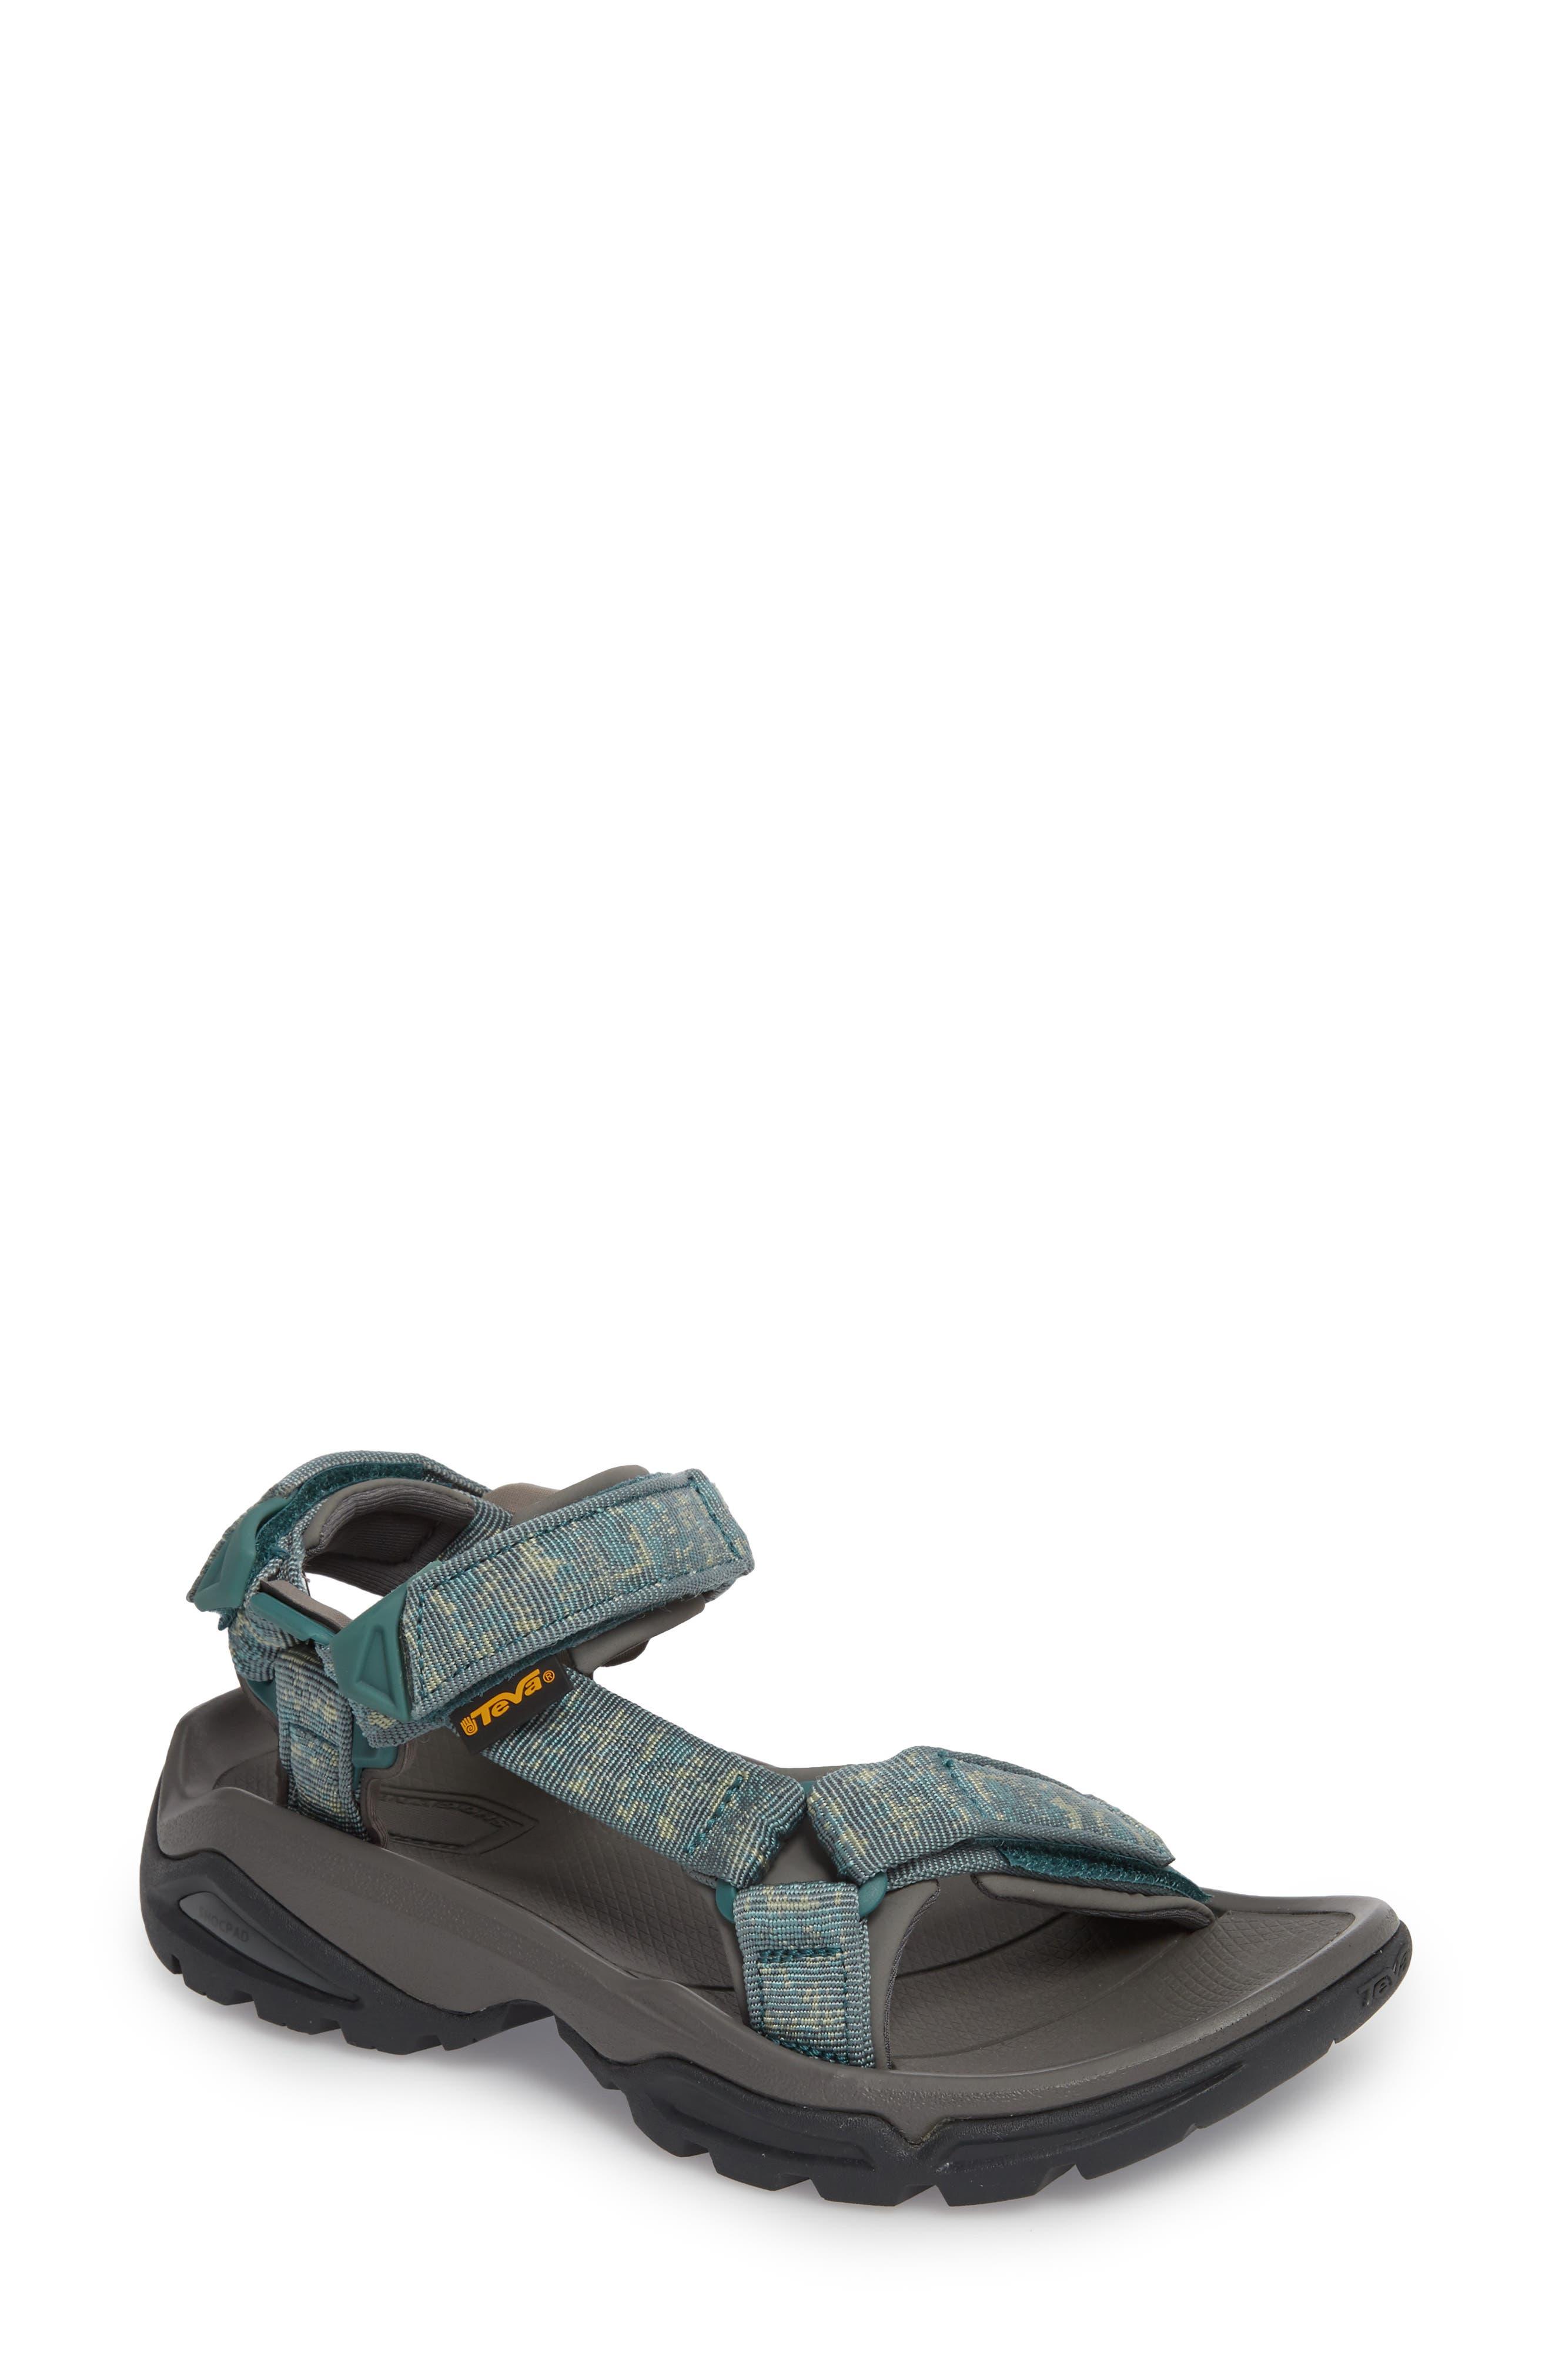 Terra FI 4 Sport Sandal,                             Main thumbnail 1, color,                             Rocio North Atlantic